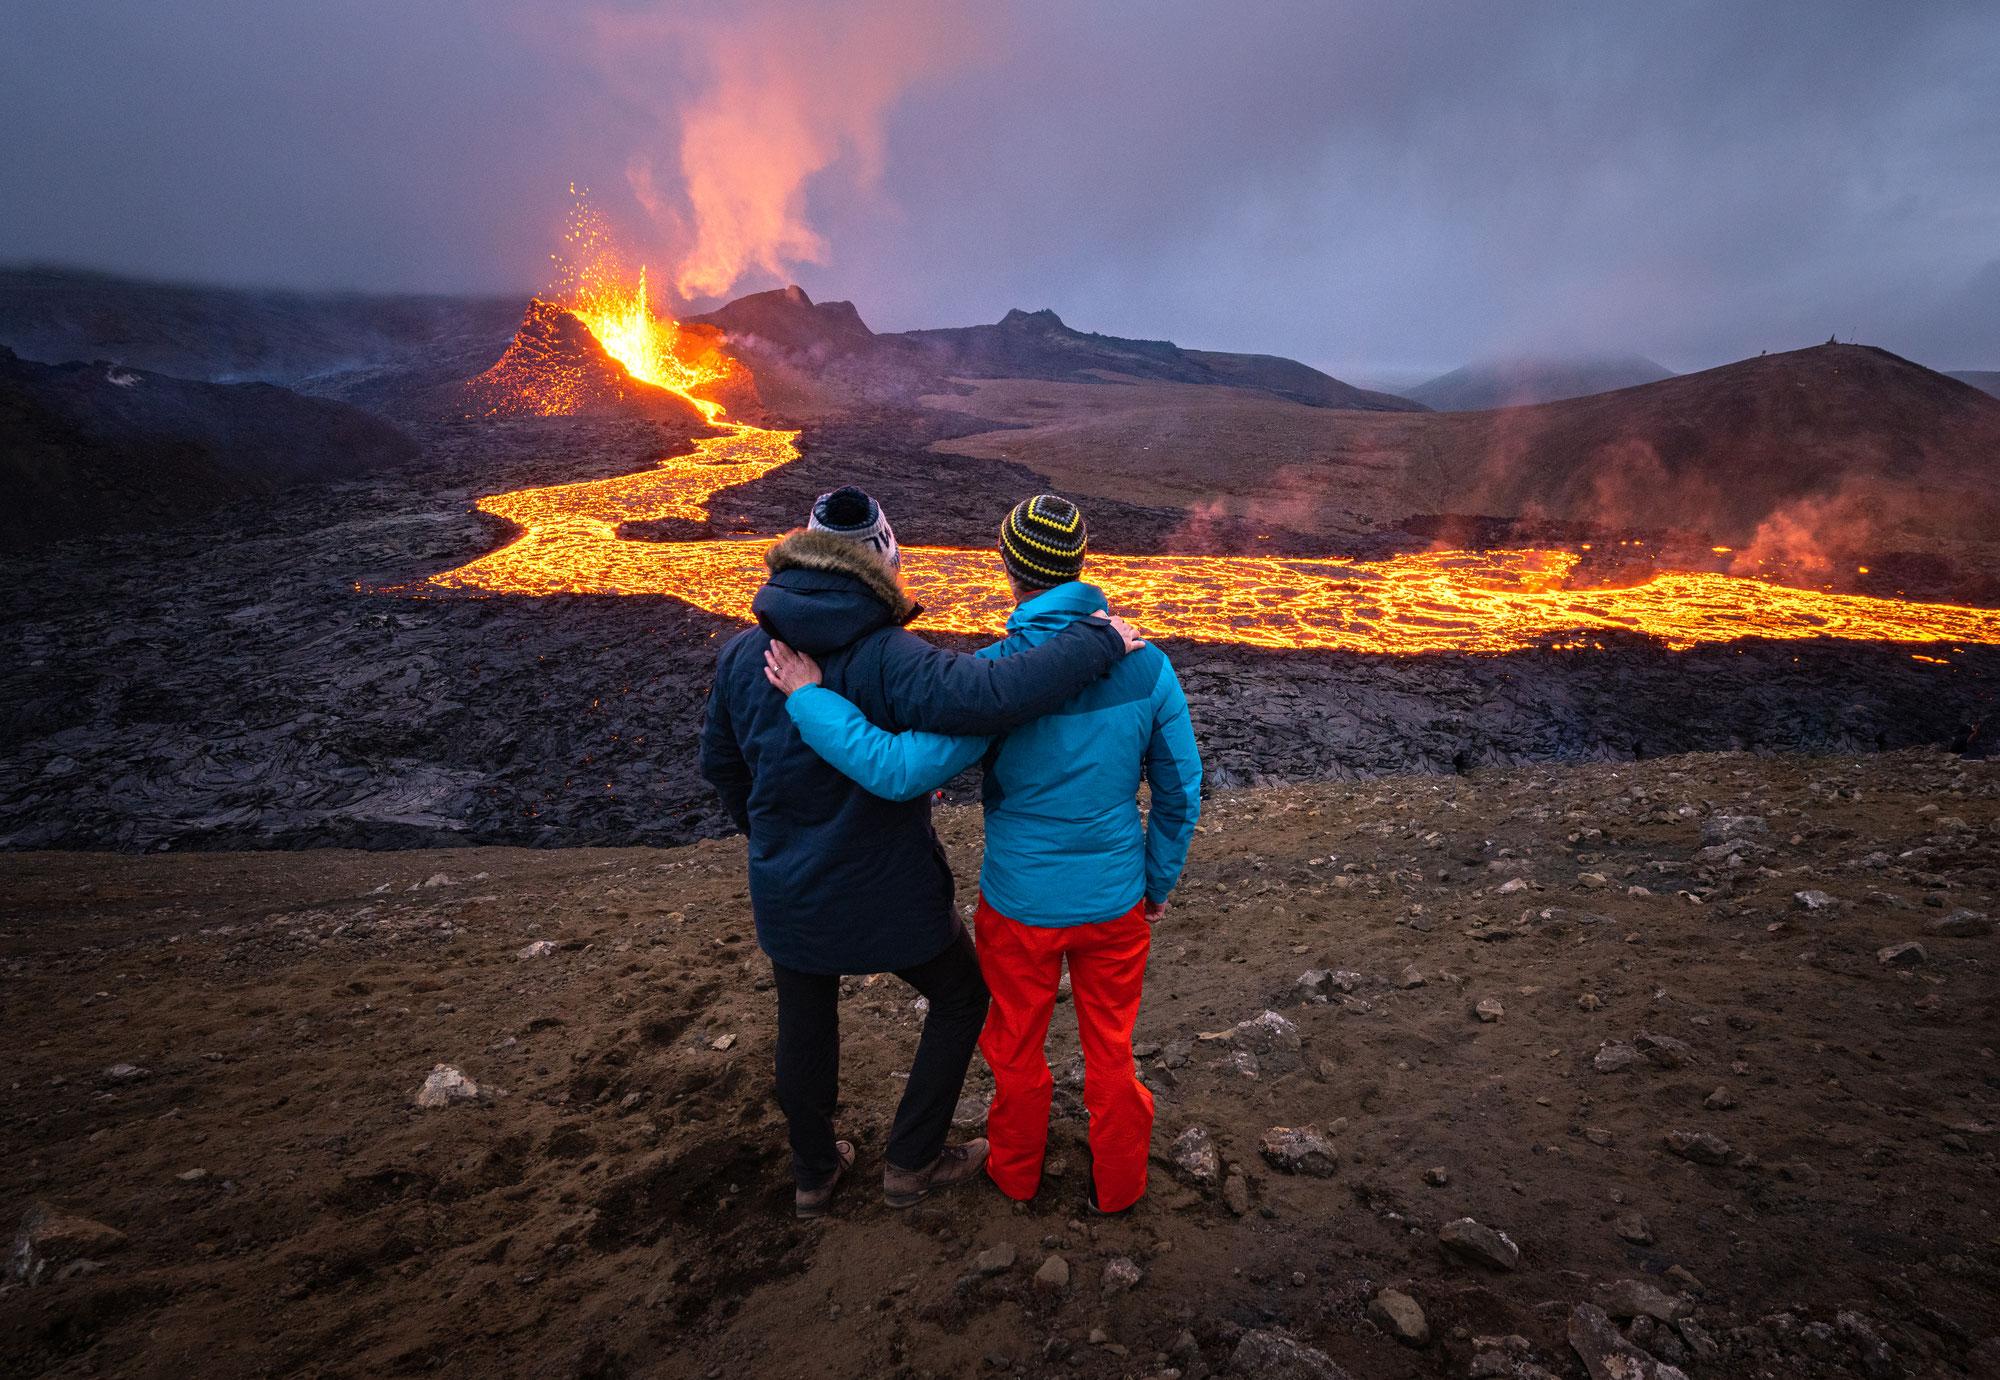 Fotoreise zum Vulkan Fagradalsfjall in Island